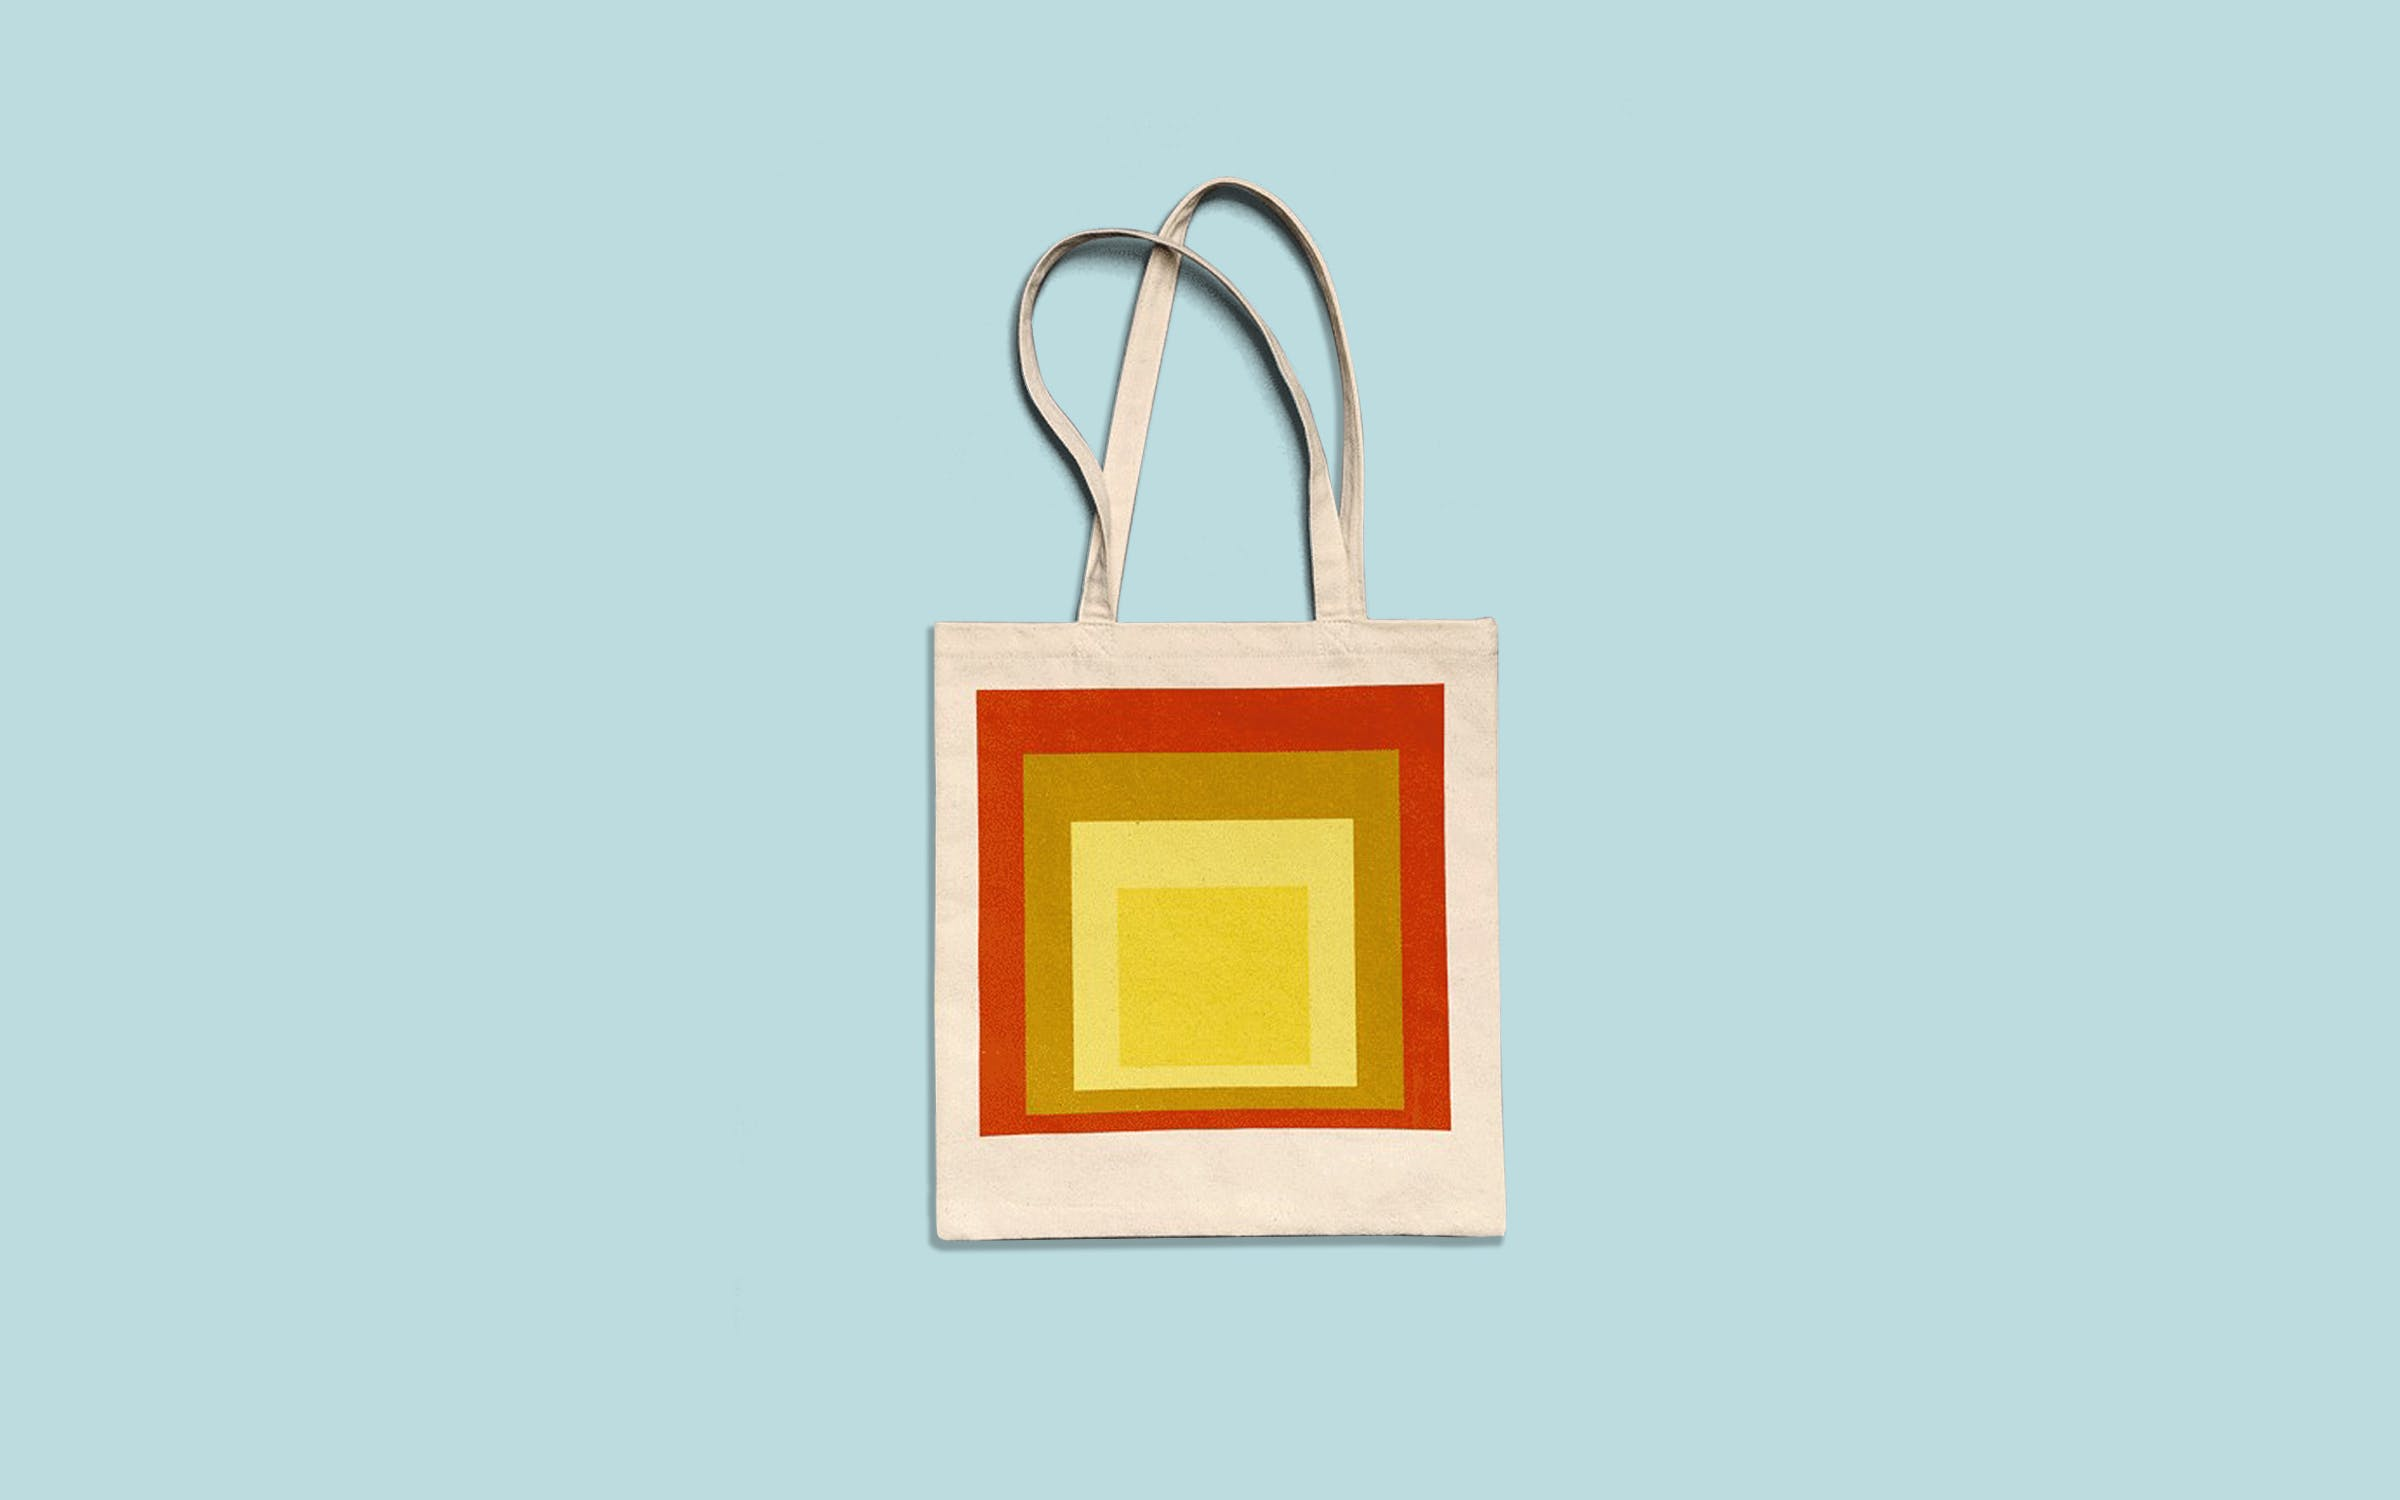 texas-museum-gift-guide-mfa-bag